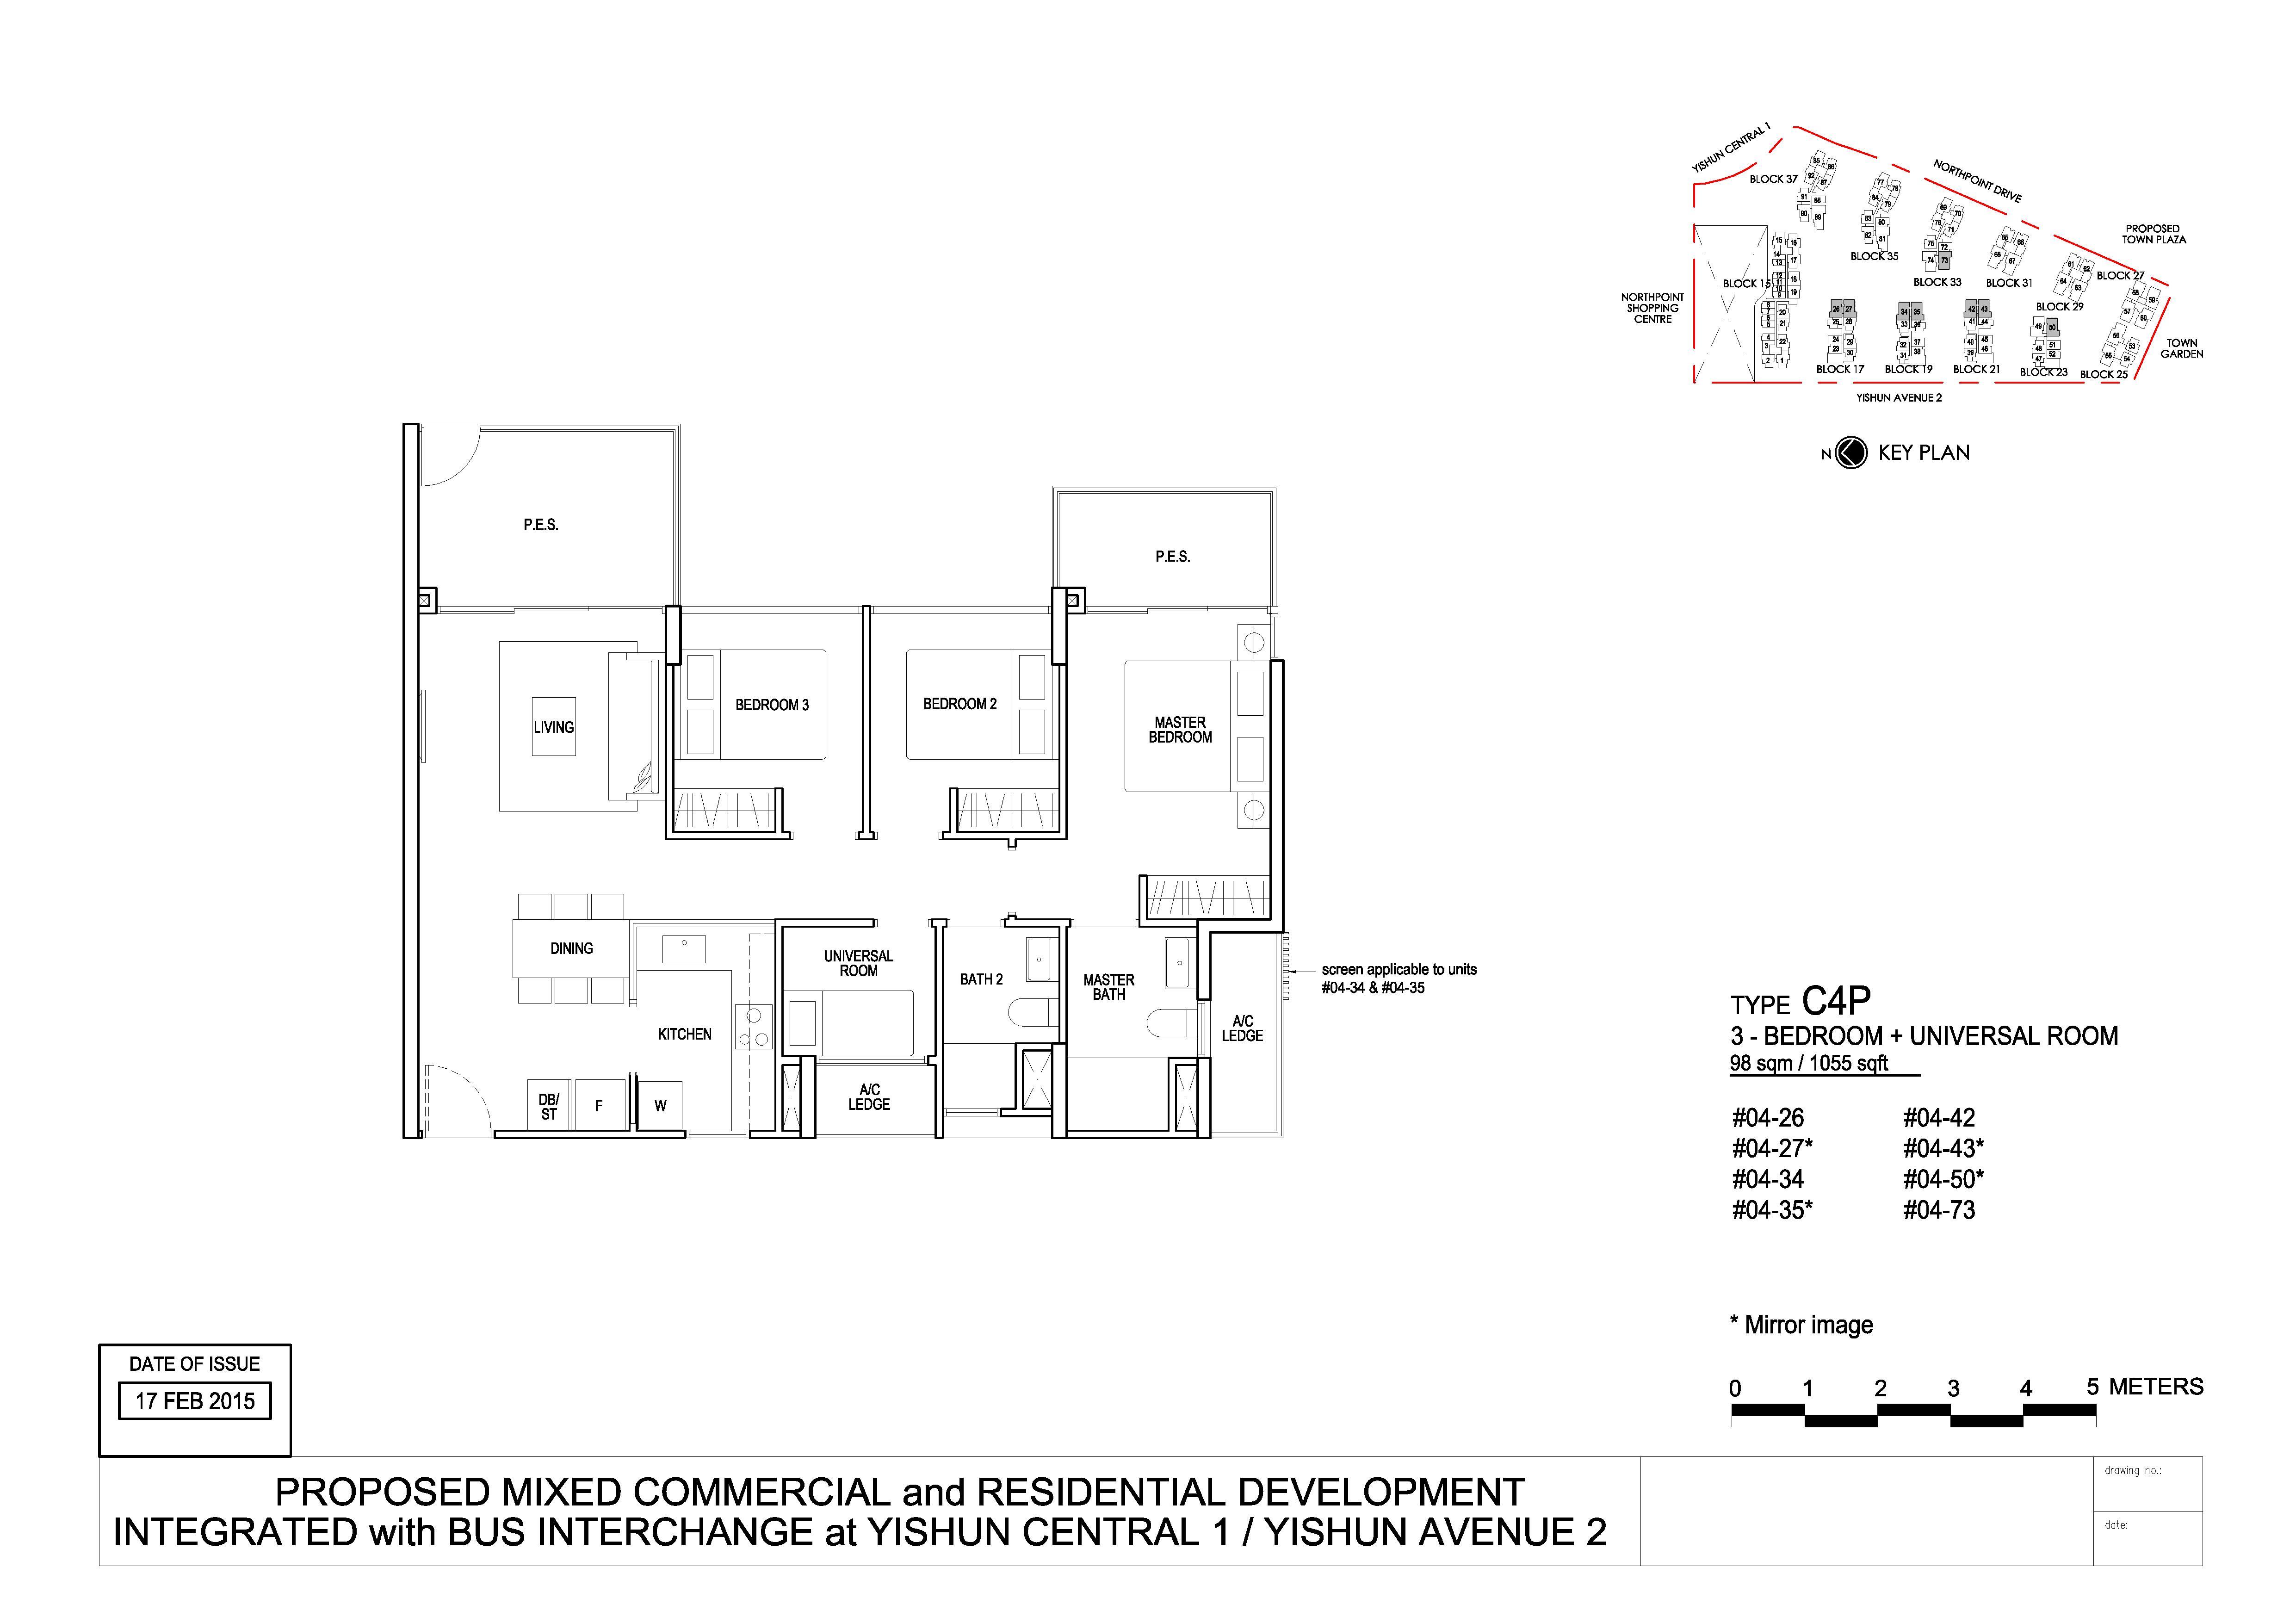 North Park Residences 3 Bedroom + Universal Type C4P Floor Plans